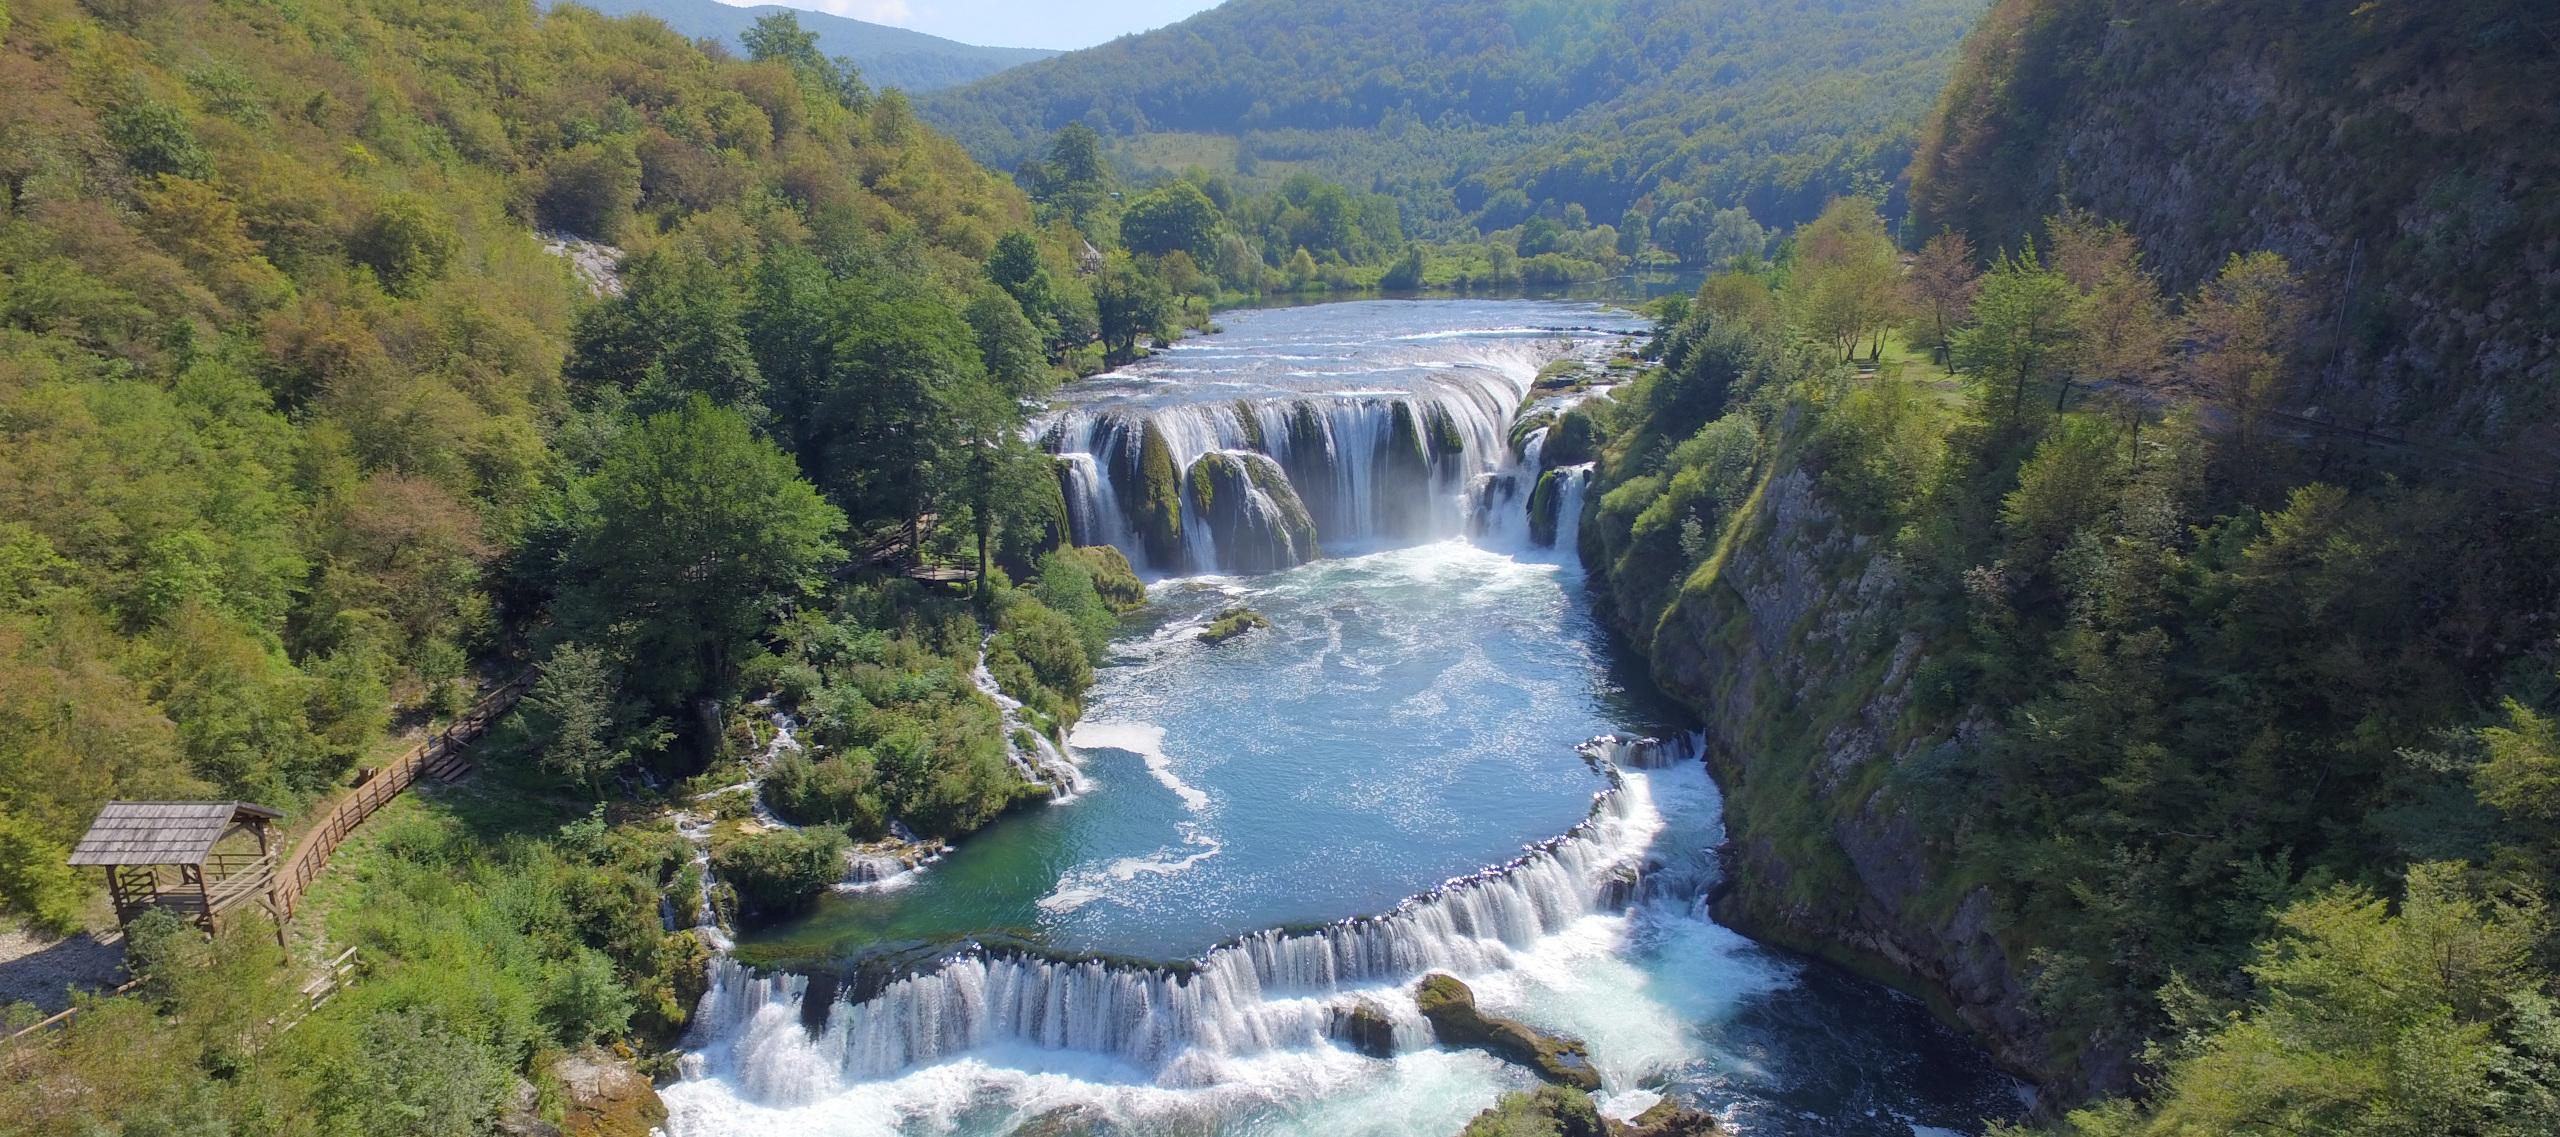 BOSNIA AND HERZEGOVINA: The Hidden Gem of the Balkan Region